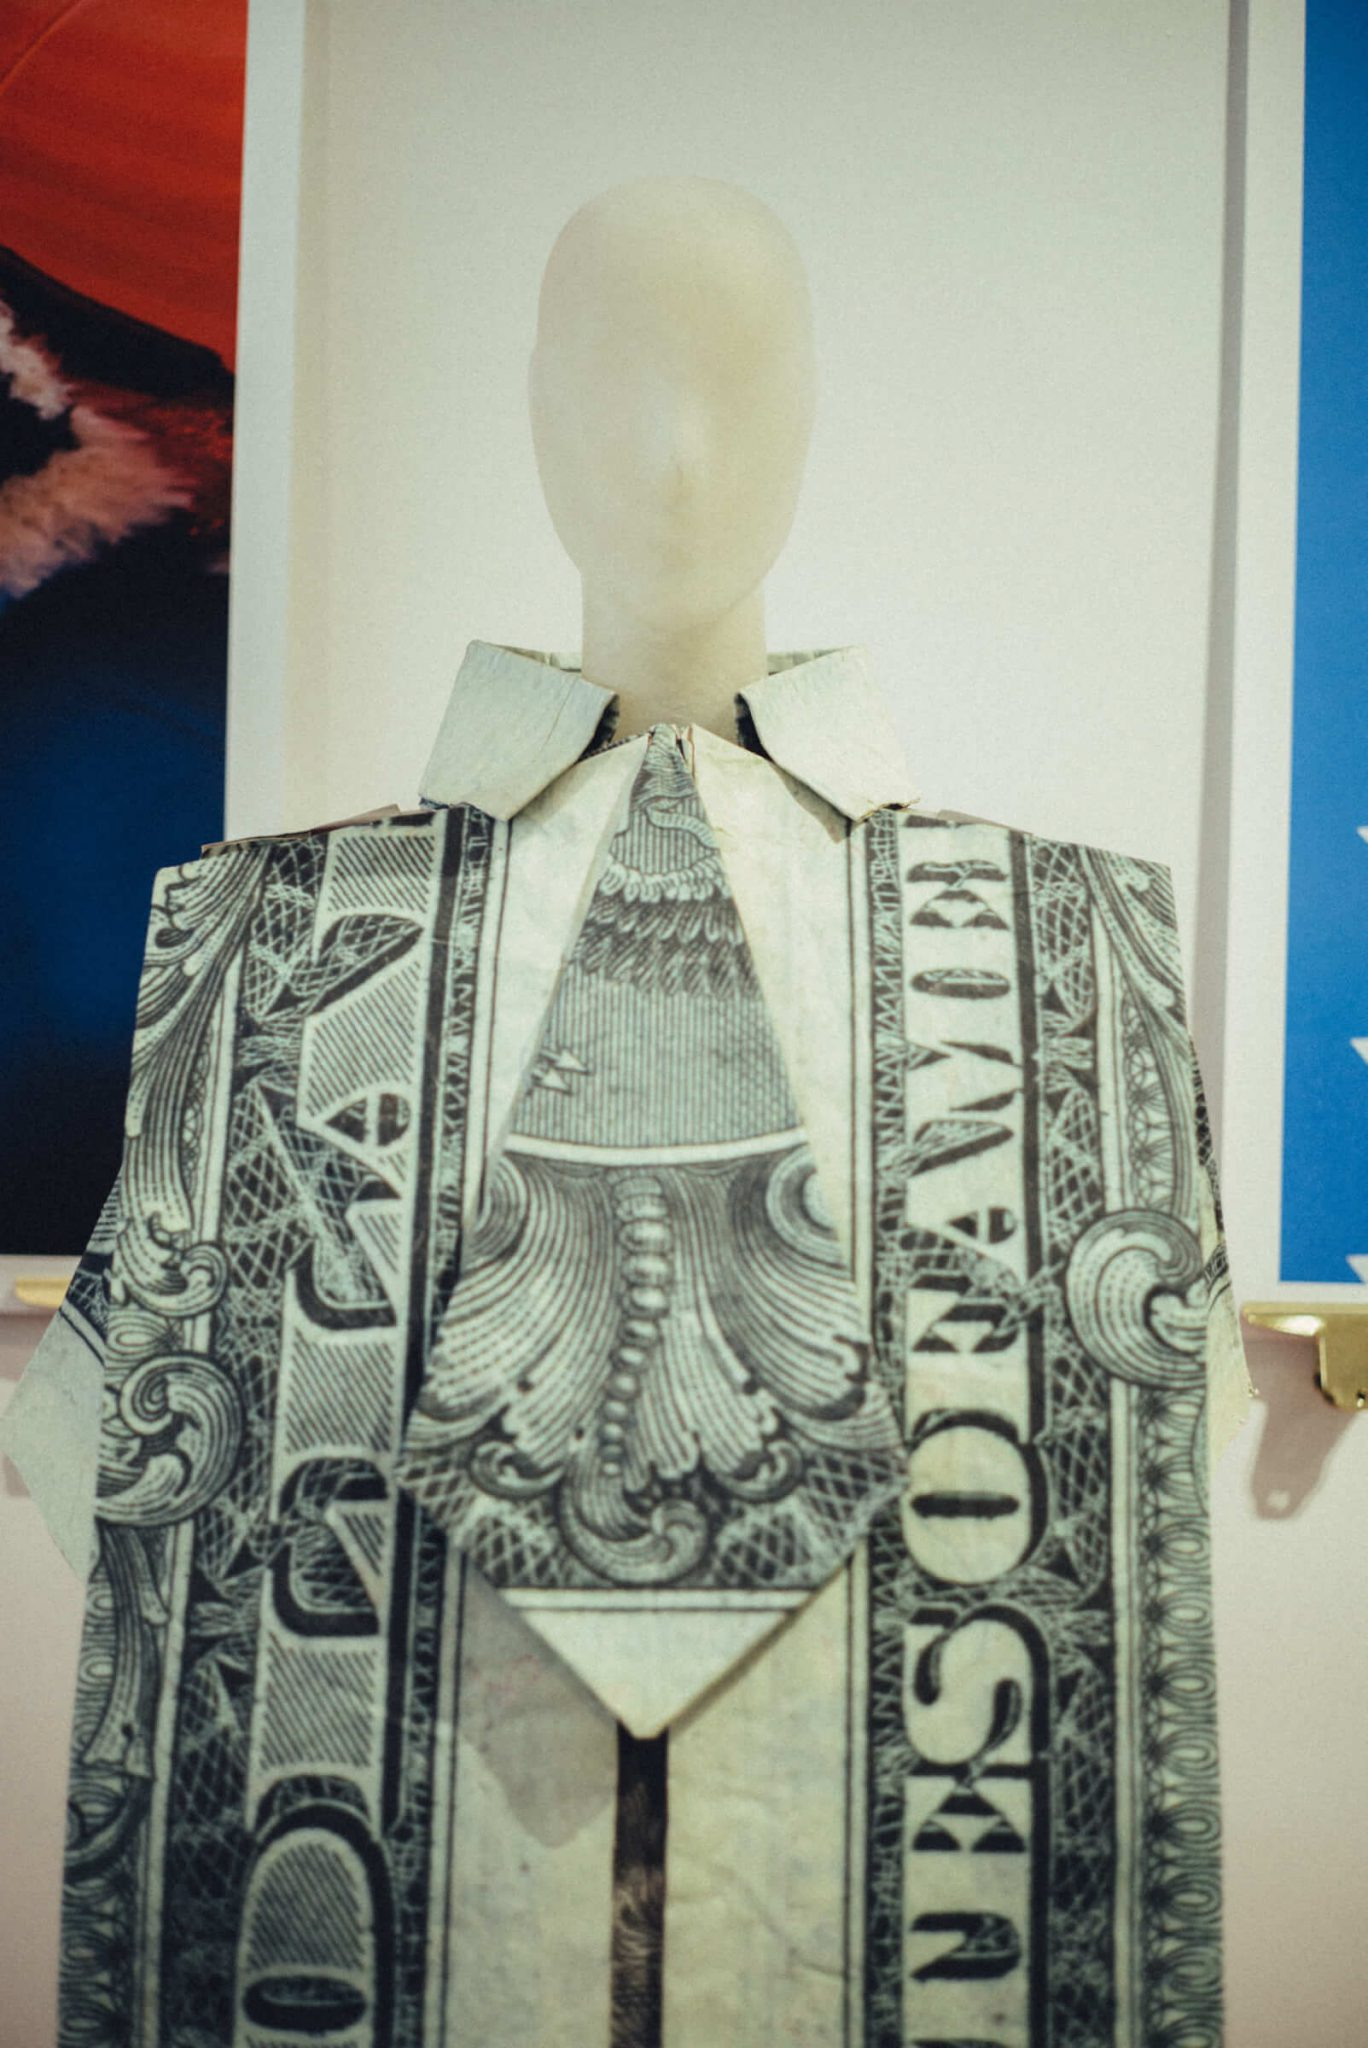 9_1120_AT_Okuda-1440x2156 ジュエリーデザイナー「KOTA OKUDA」のNYC散策ルート。チェルシーの骨董市から、ハーレムのストリートで受けとる音と刺激